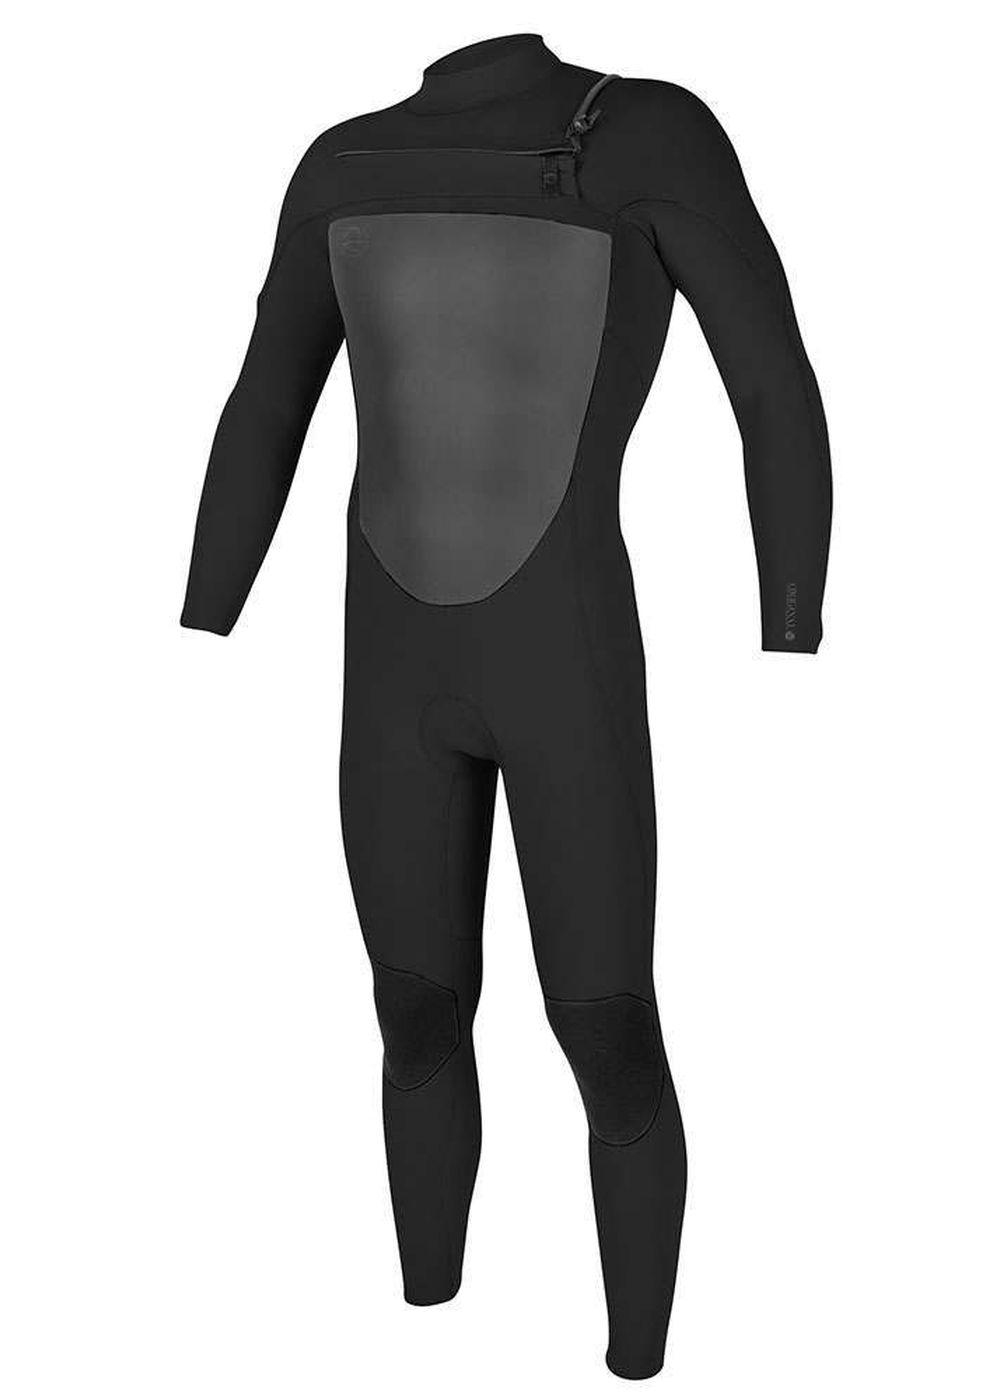 Oneill Original Fz 5/4 Wetsuit 2018 Black Picture